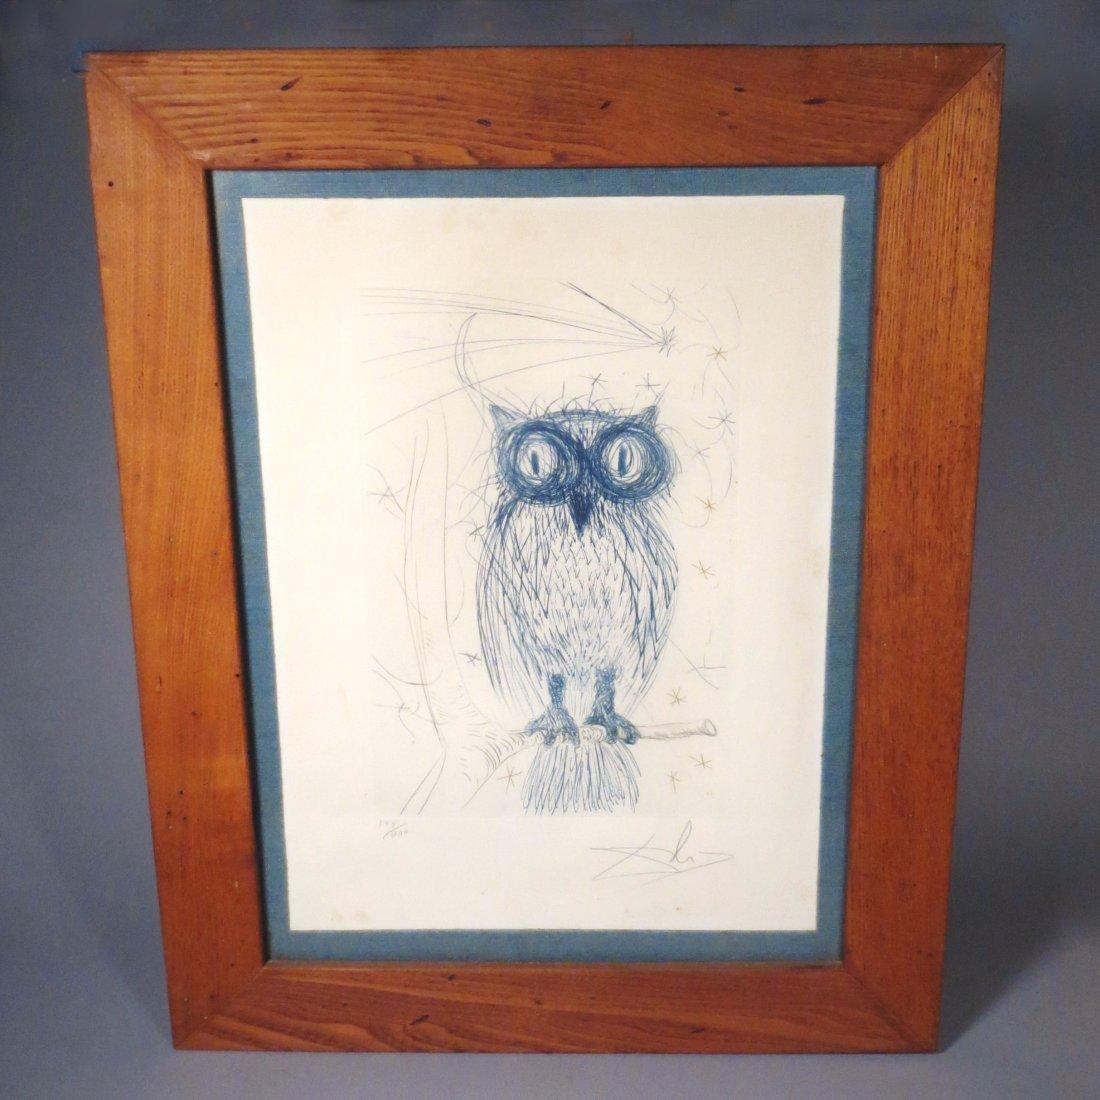 Dali La Chouette Bleue (The Blue Owl) drypoint Signed